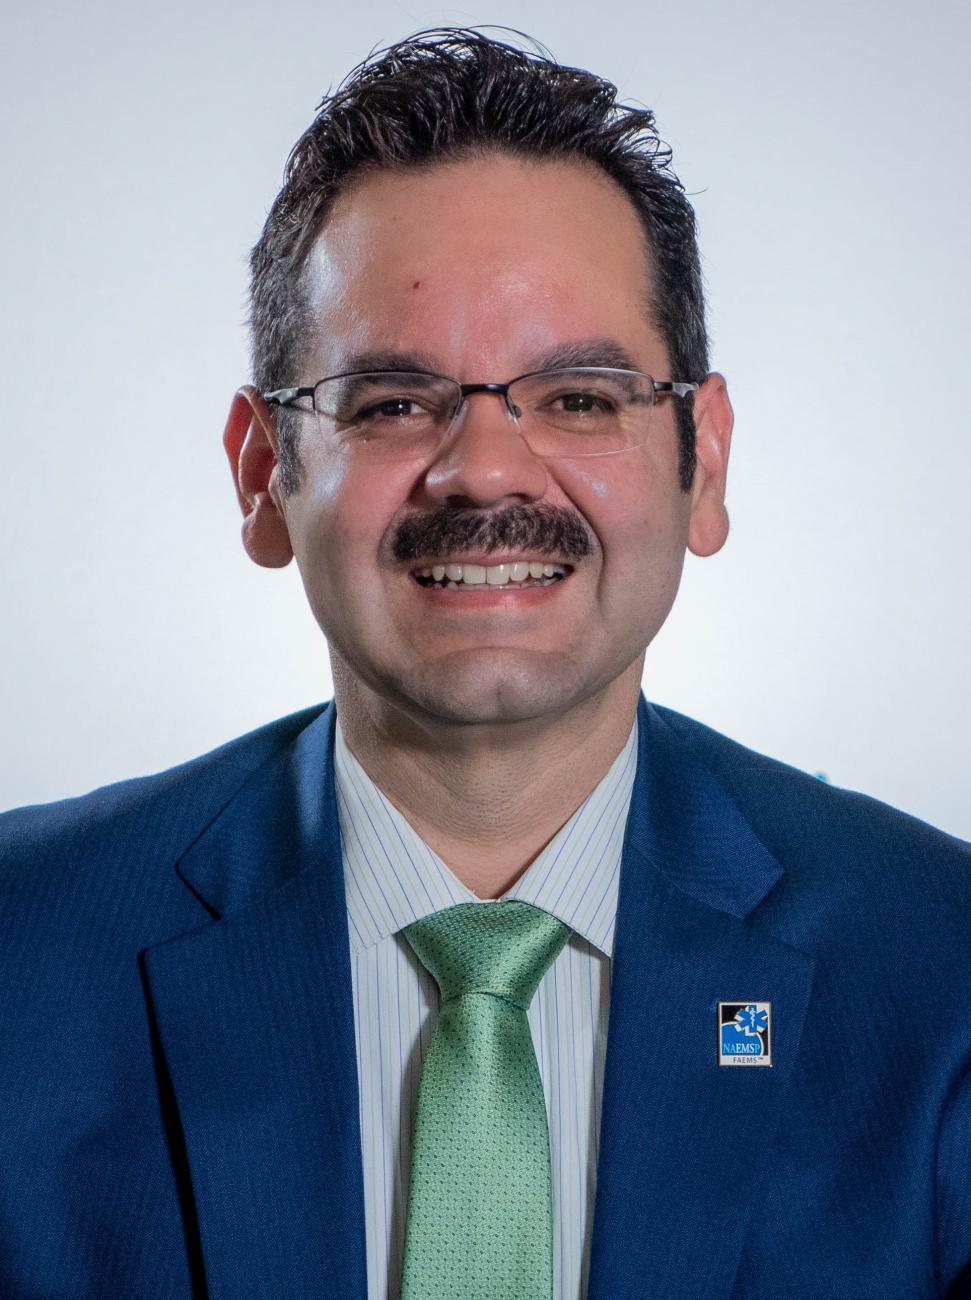 Dr. Jose Cabanas smiling portrait